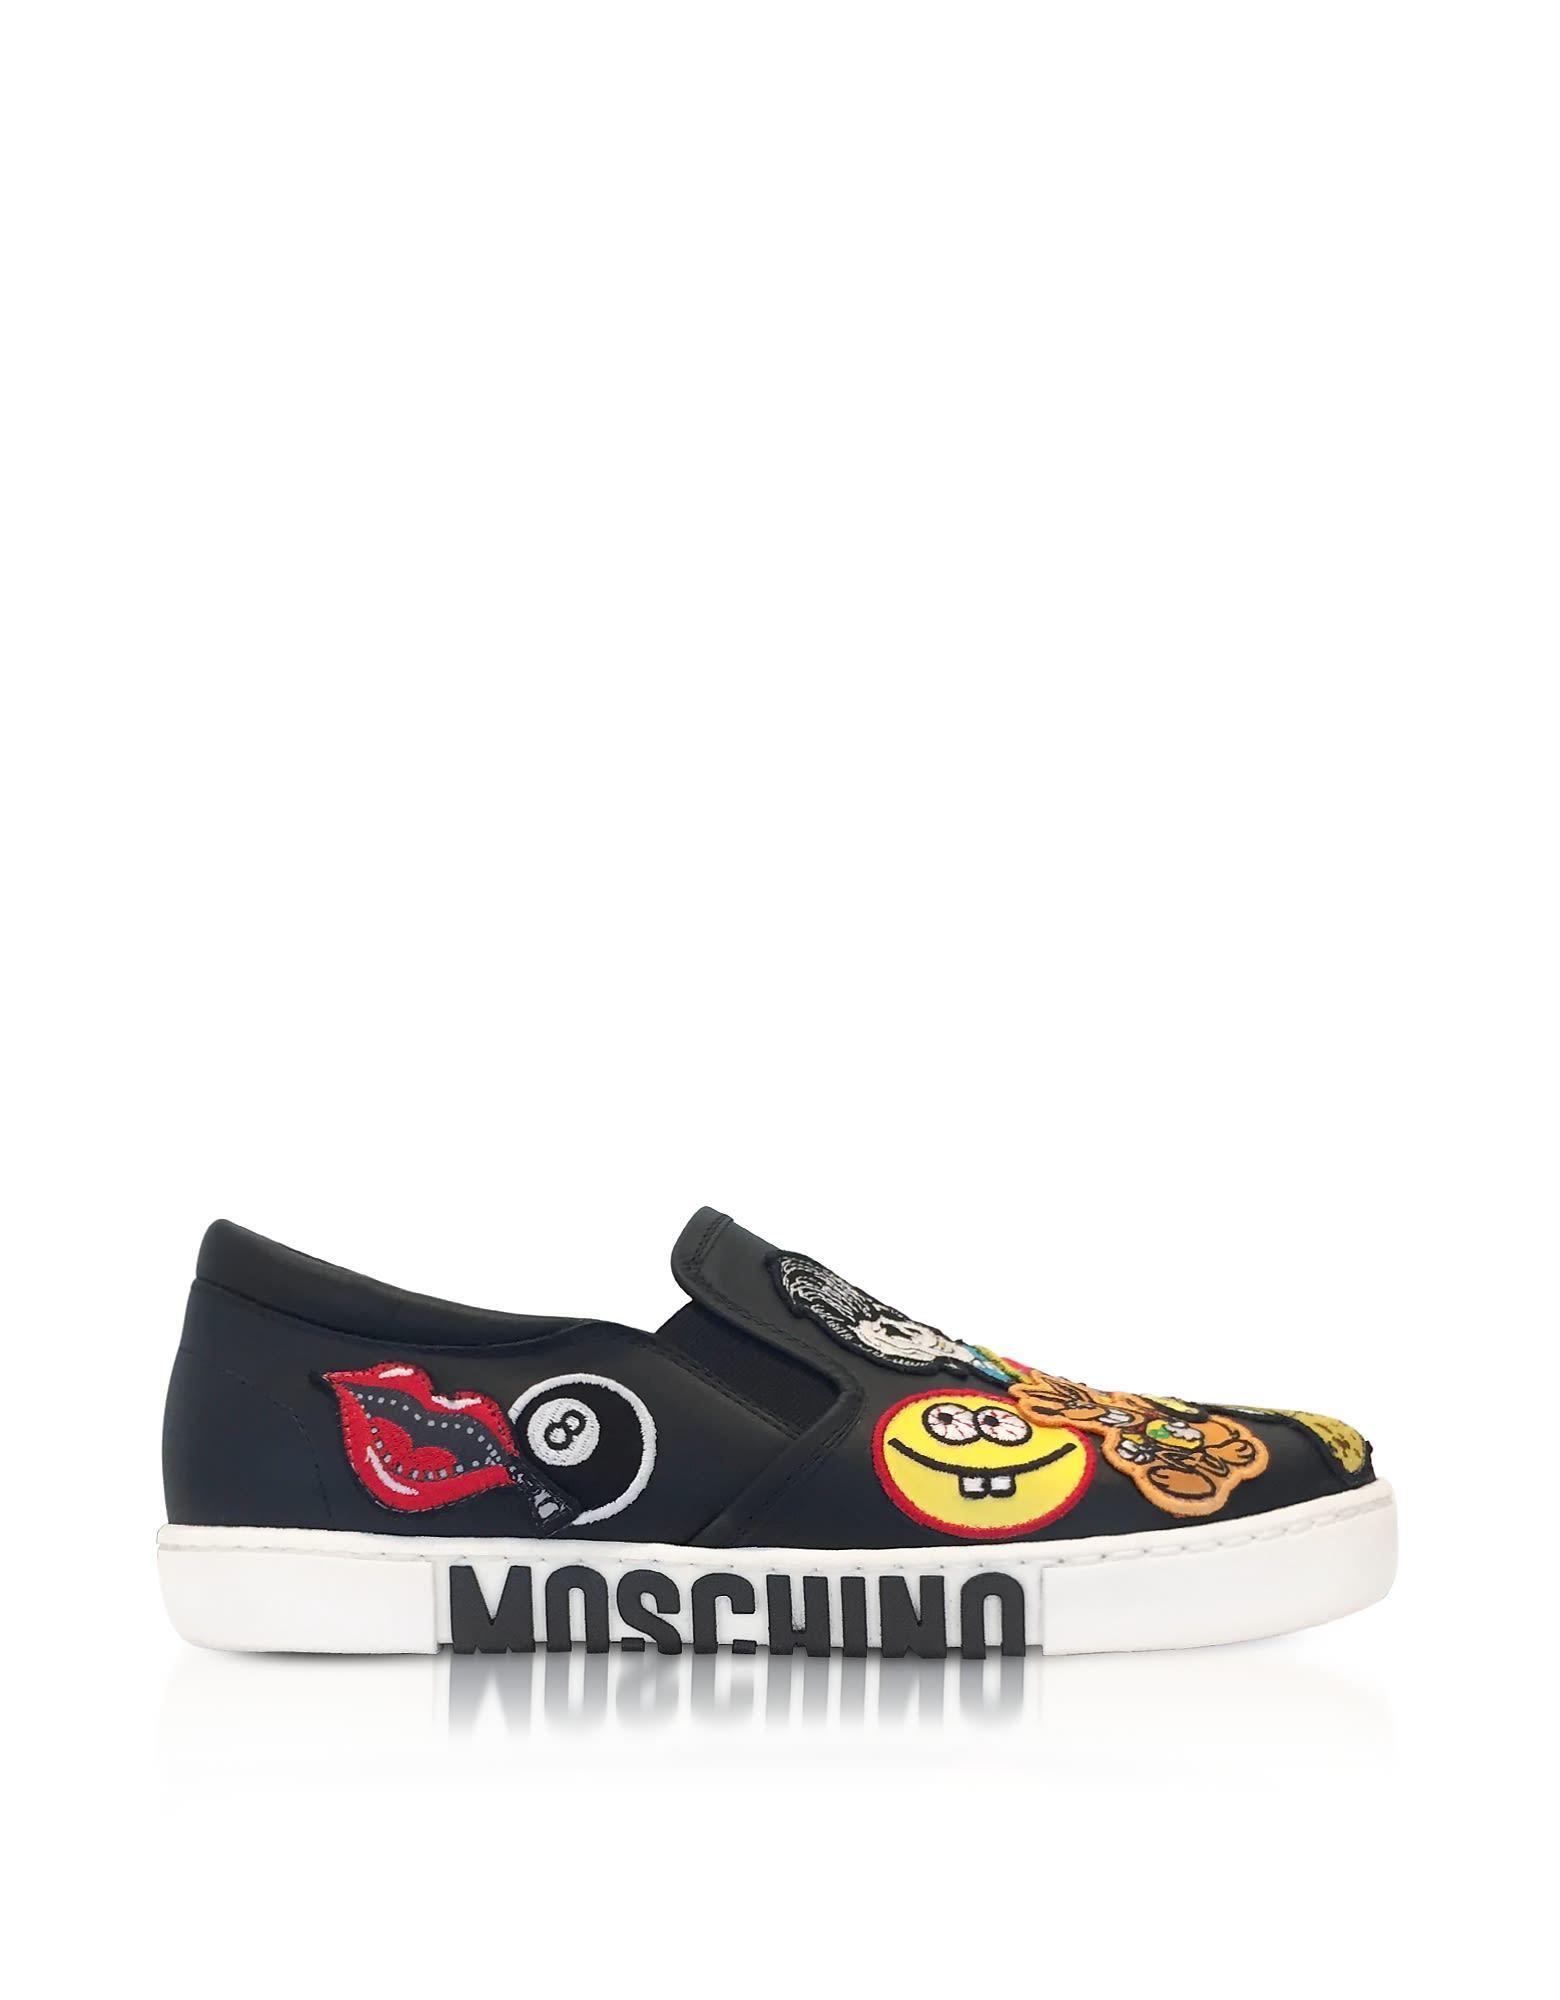 Moschino Moschino Black Leather Slip On